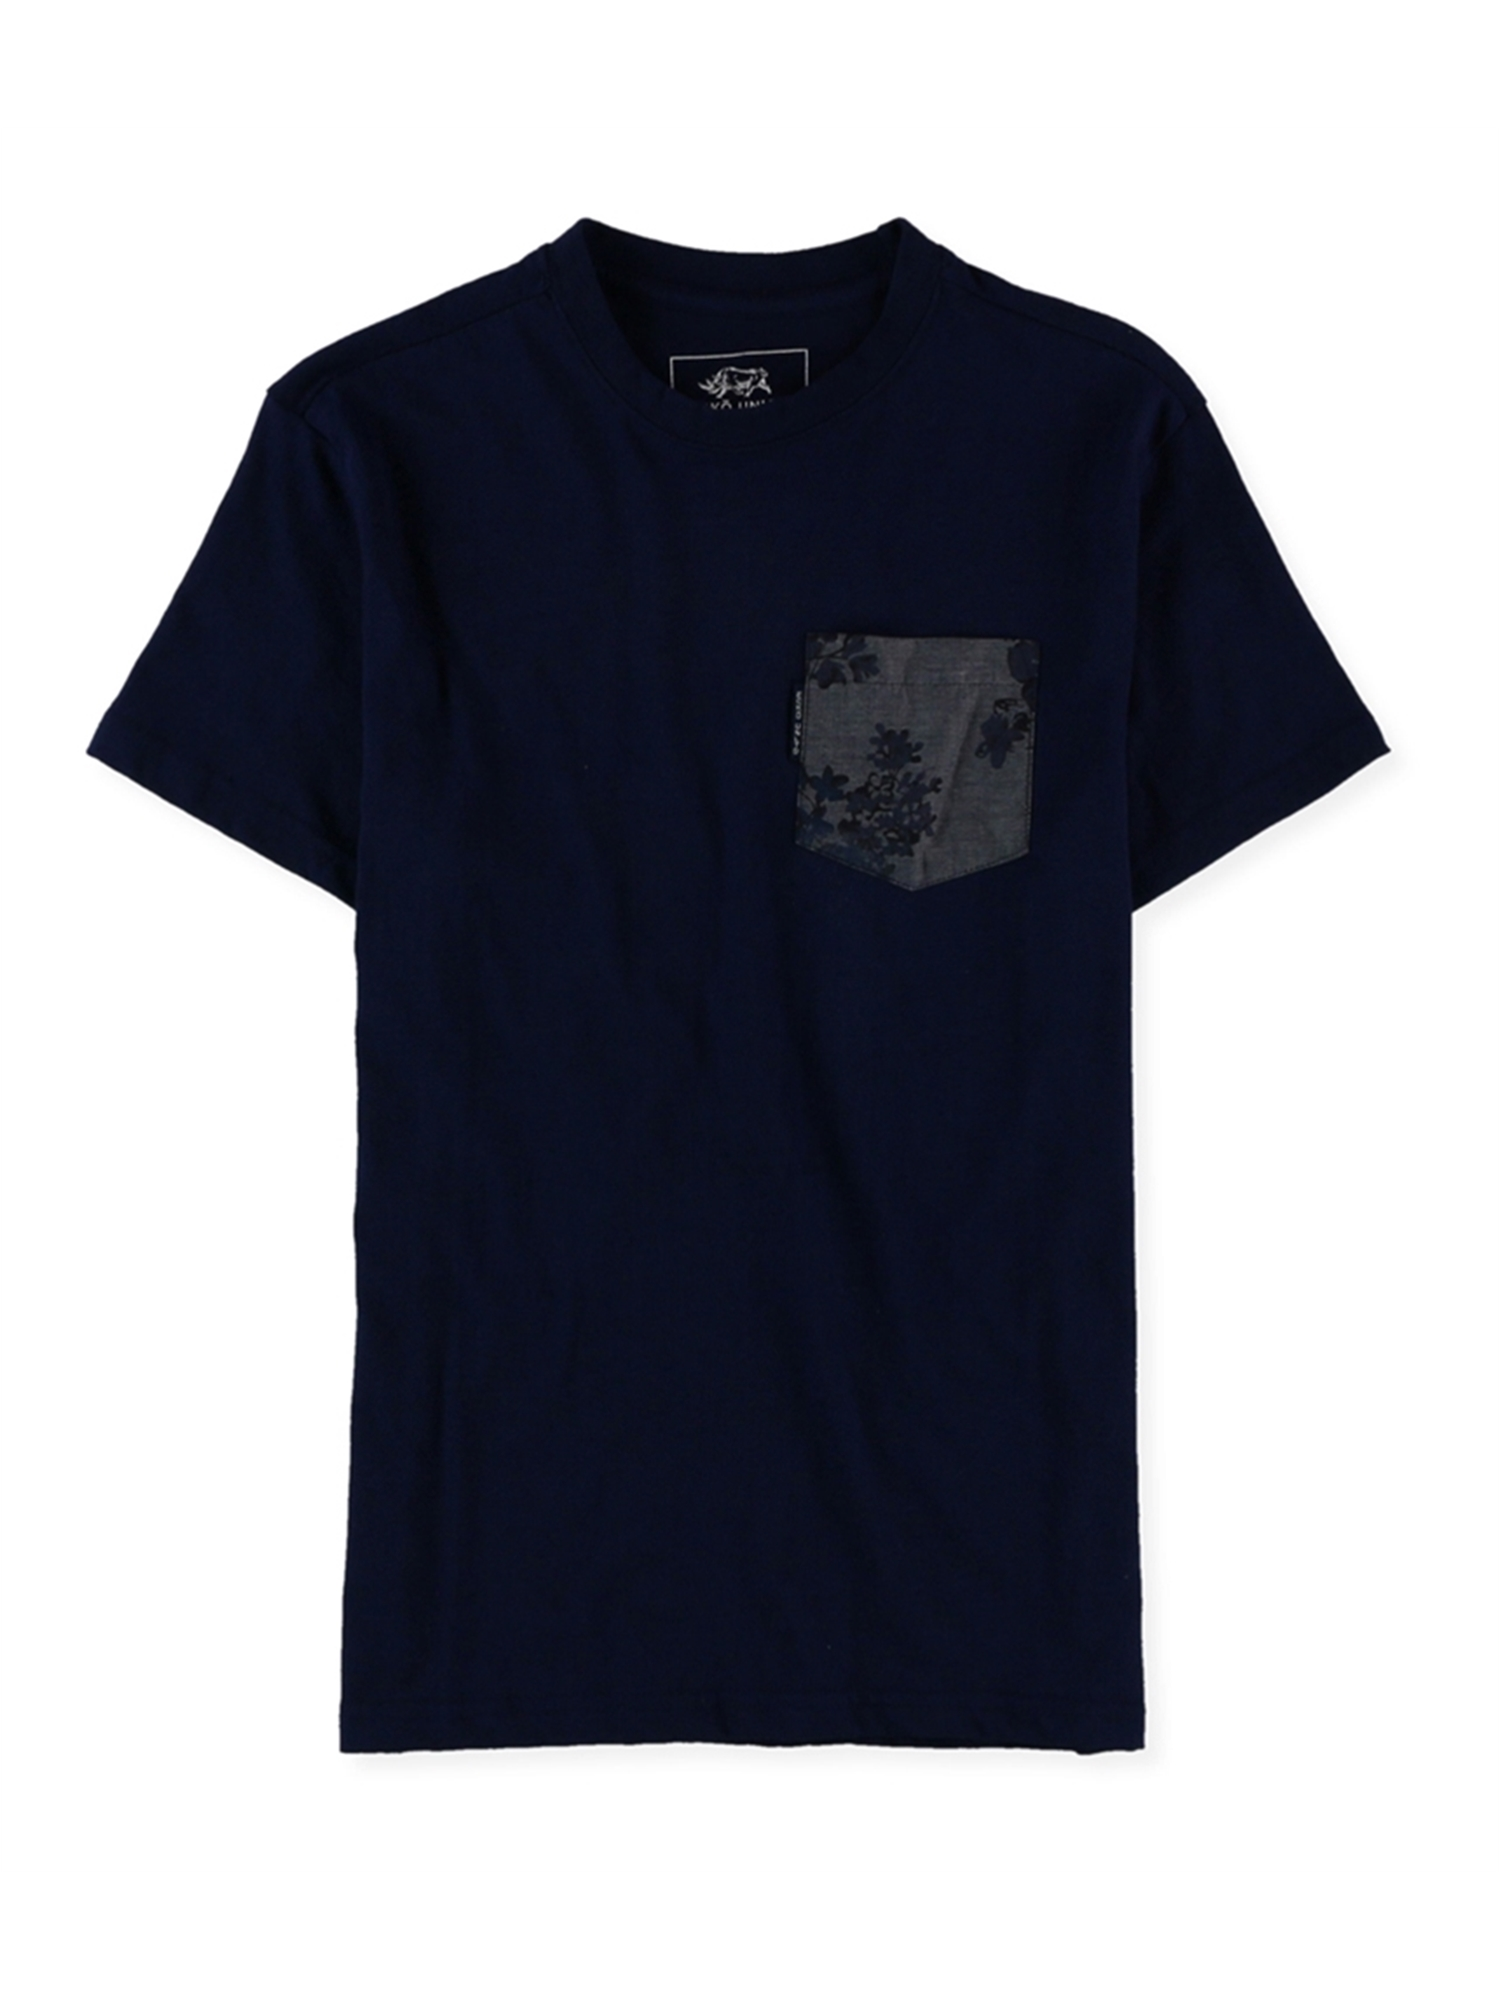 Ecko Unltd Big and Tall 3XLT Blue Black Gray Long Sleeve Crew Neck Shirt